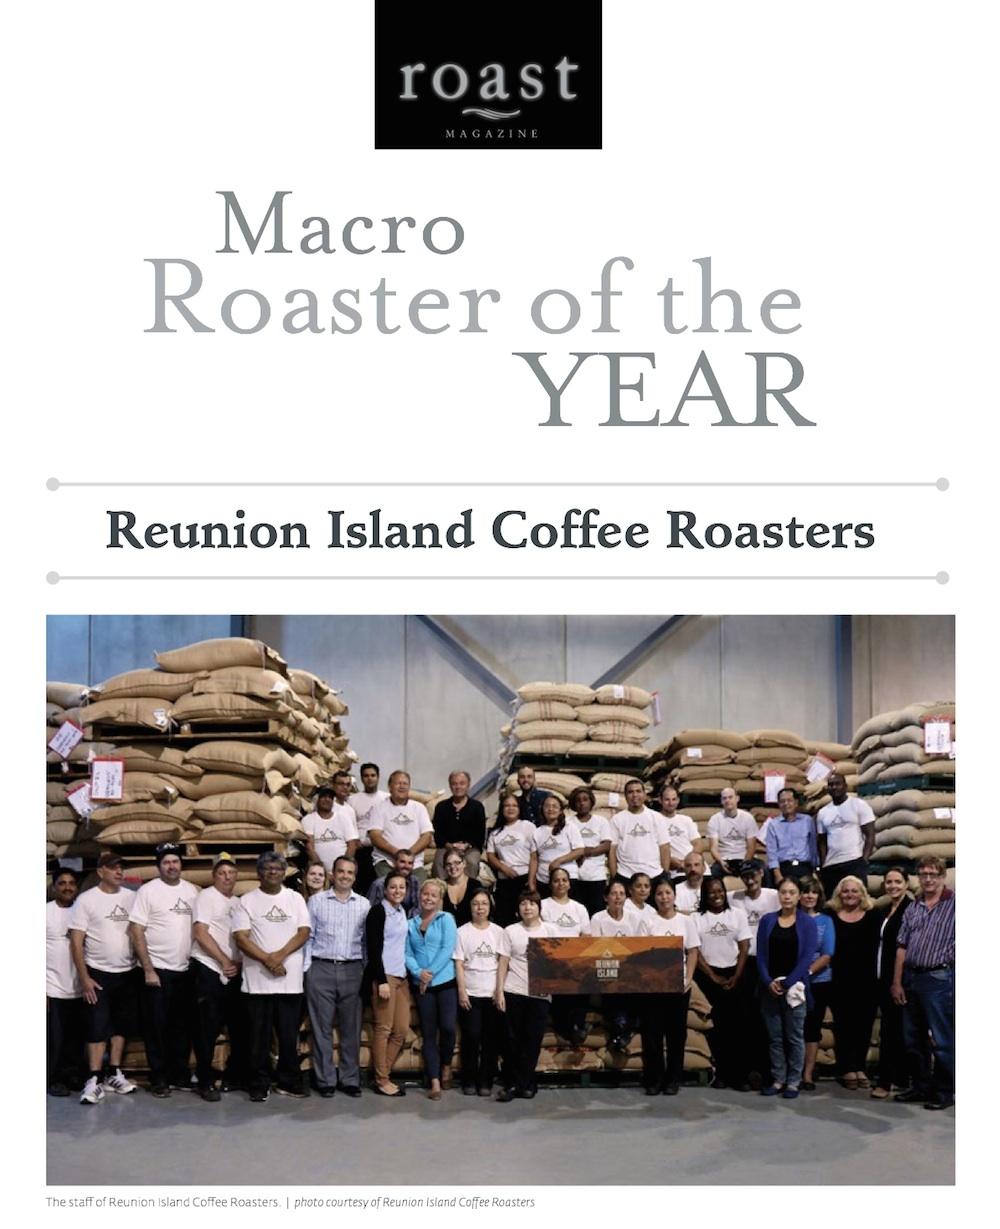 Reunion Island Coffee Roasters Roast Magazine roaster of the year